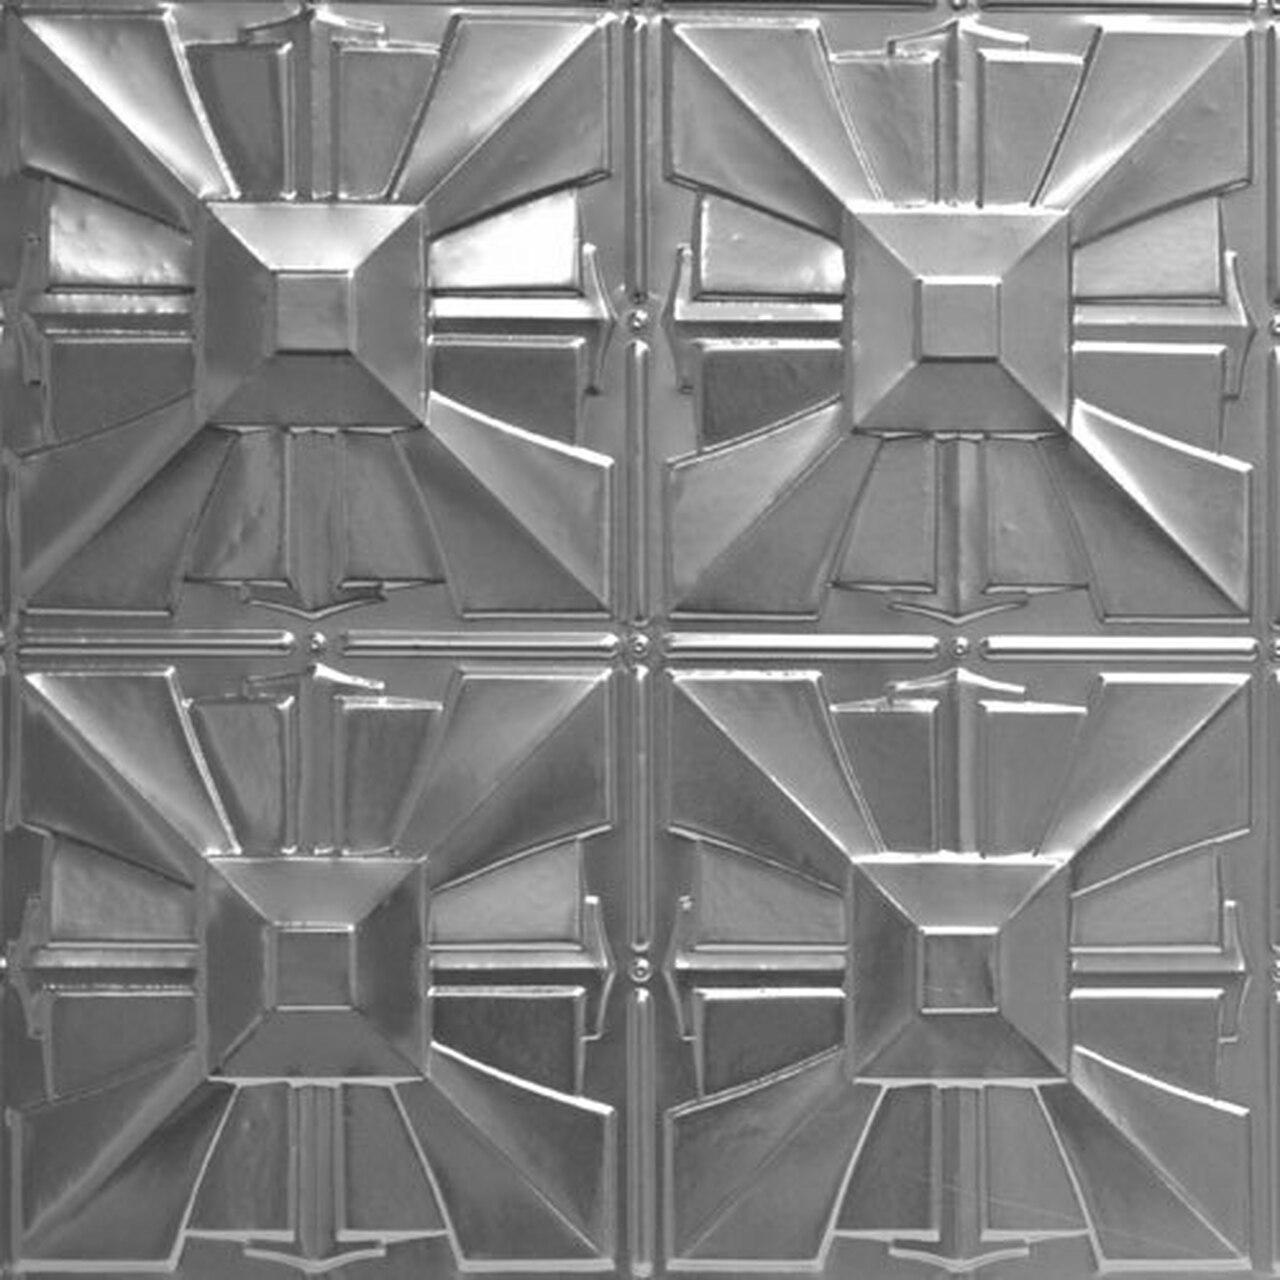 Yucatan - Shanko Tin Plated Steel Ceiling Tile - #314